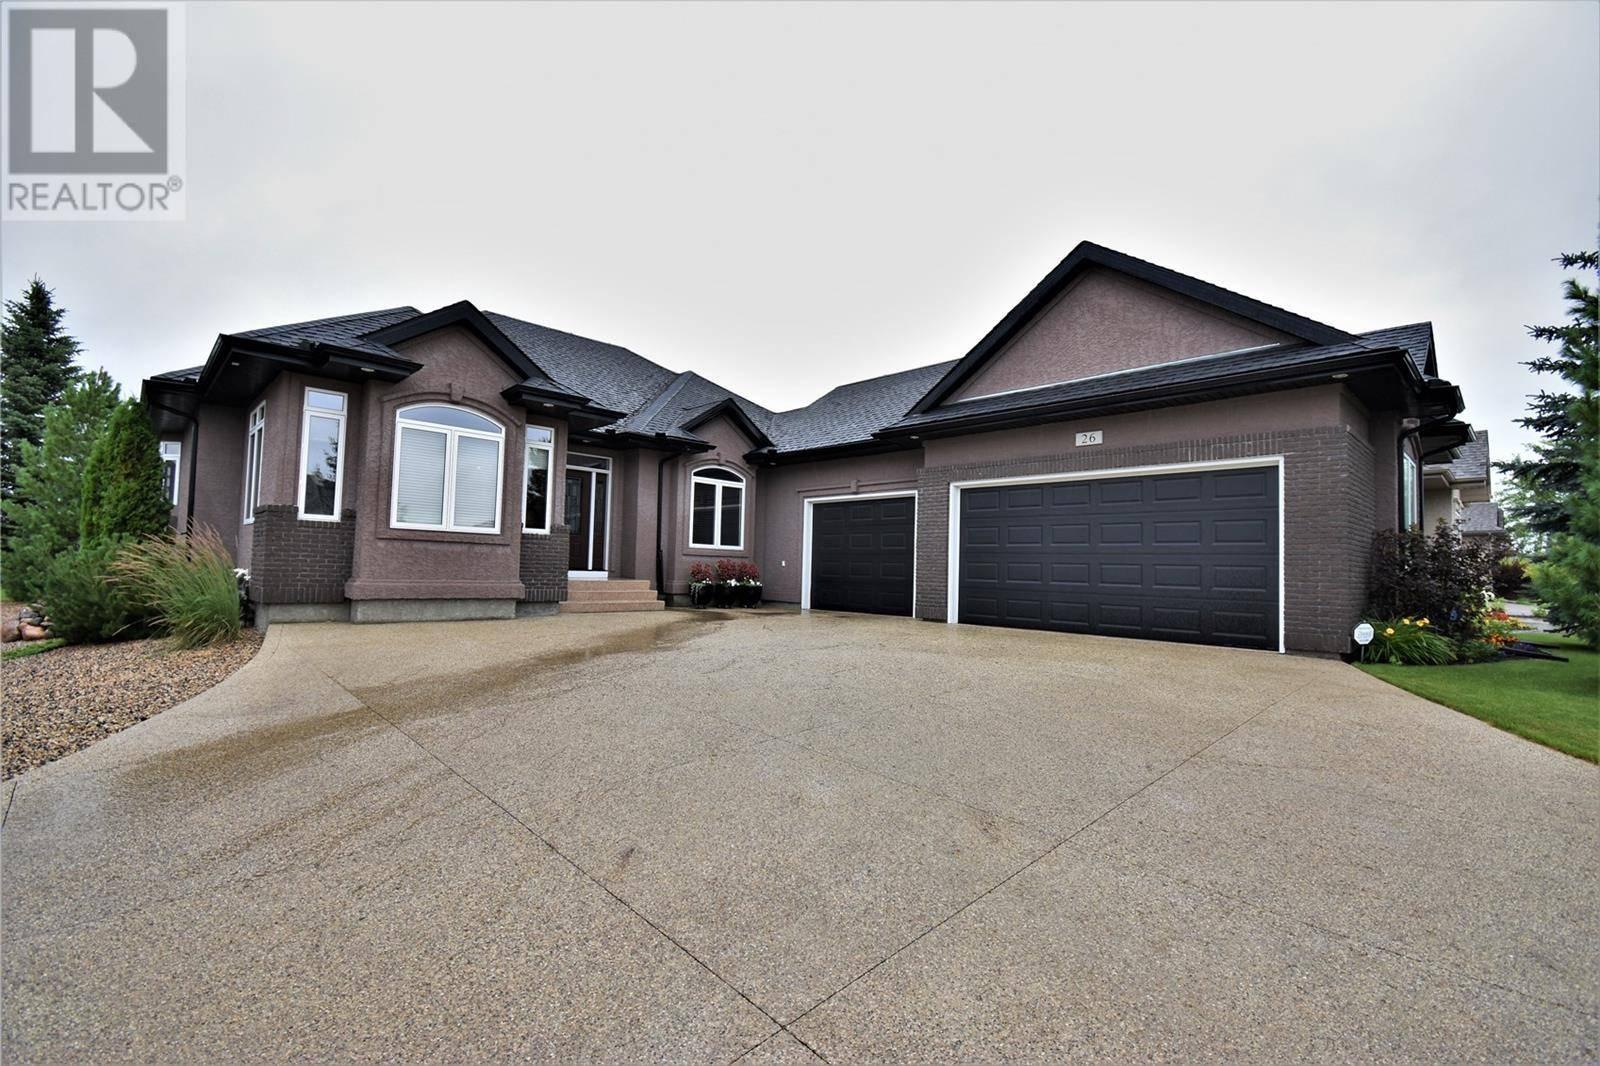 House for sale at 501 Cartwright St Unit 26 Saskatoon Saskatchewan - MLS: SK781285